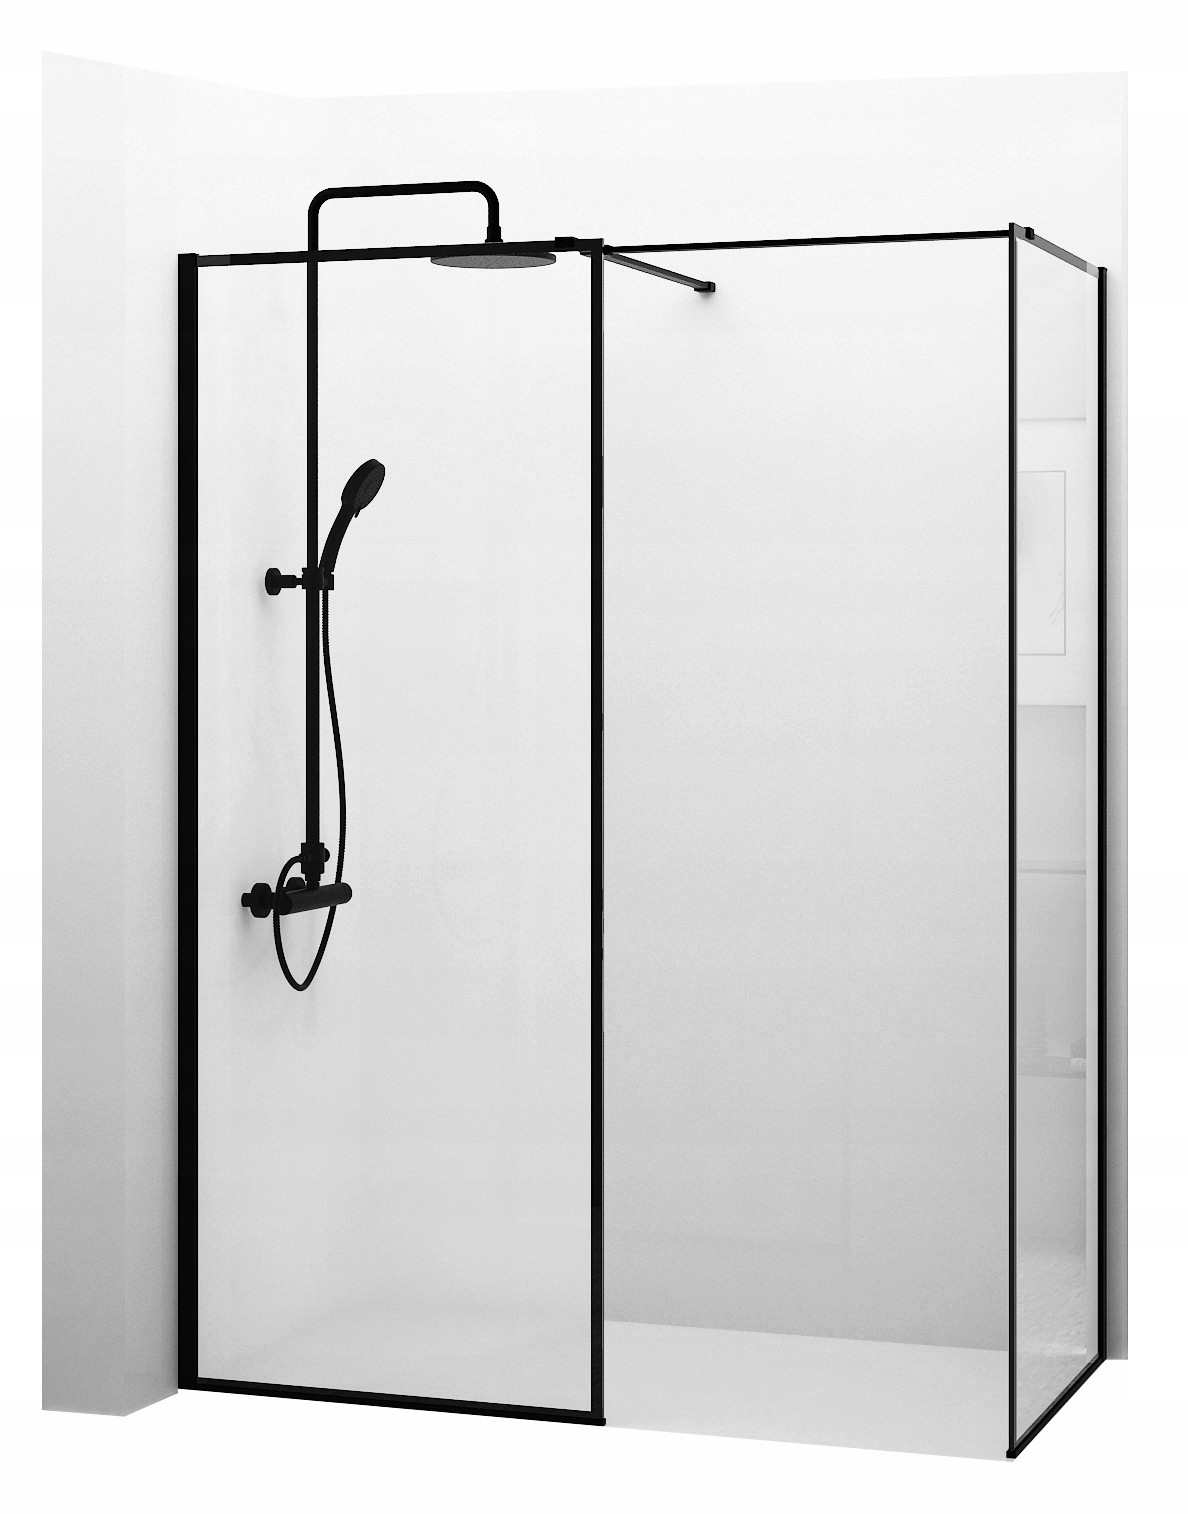 Sprchová kabína BLER Black Walk-In 70x70cm